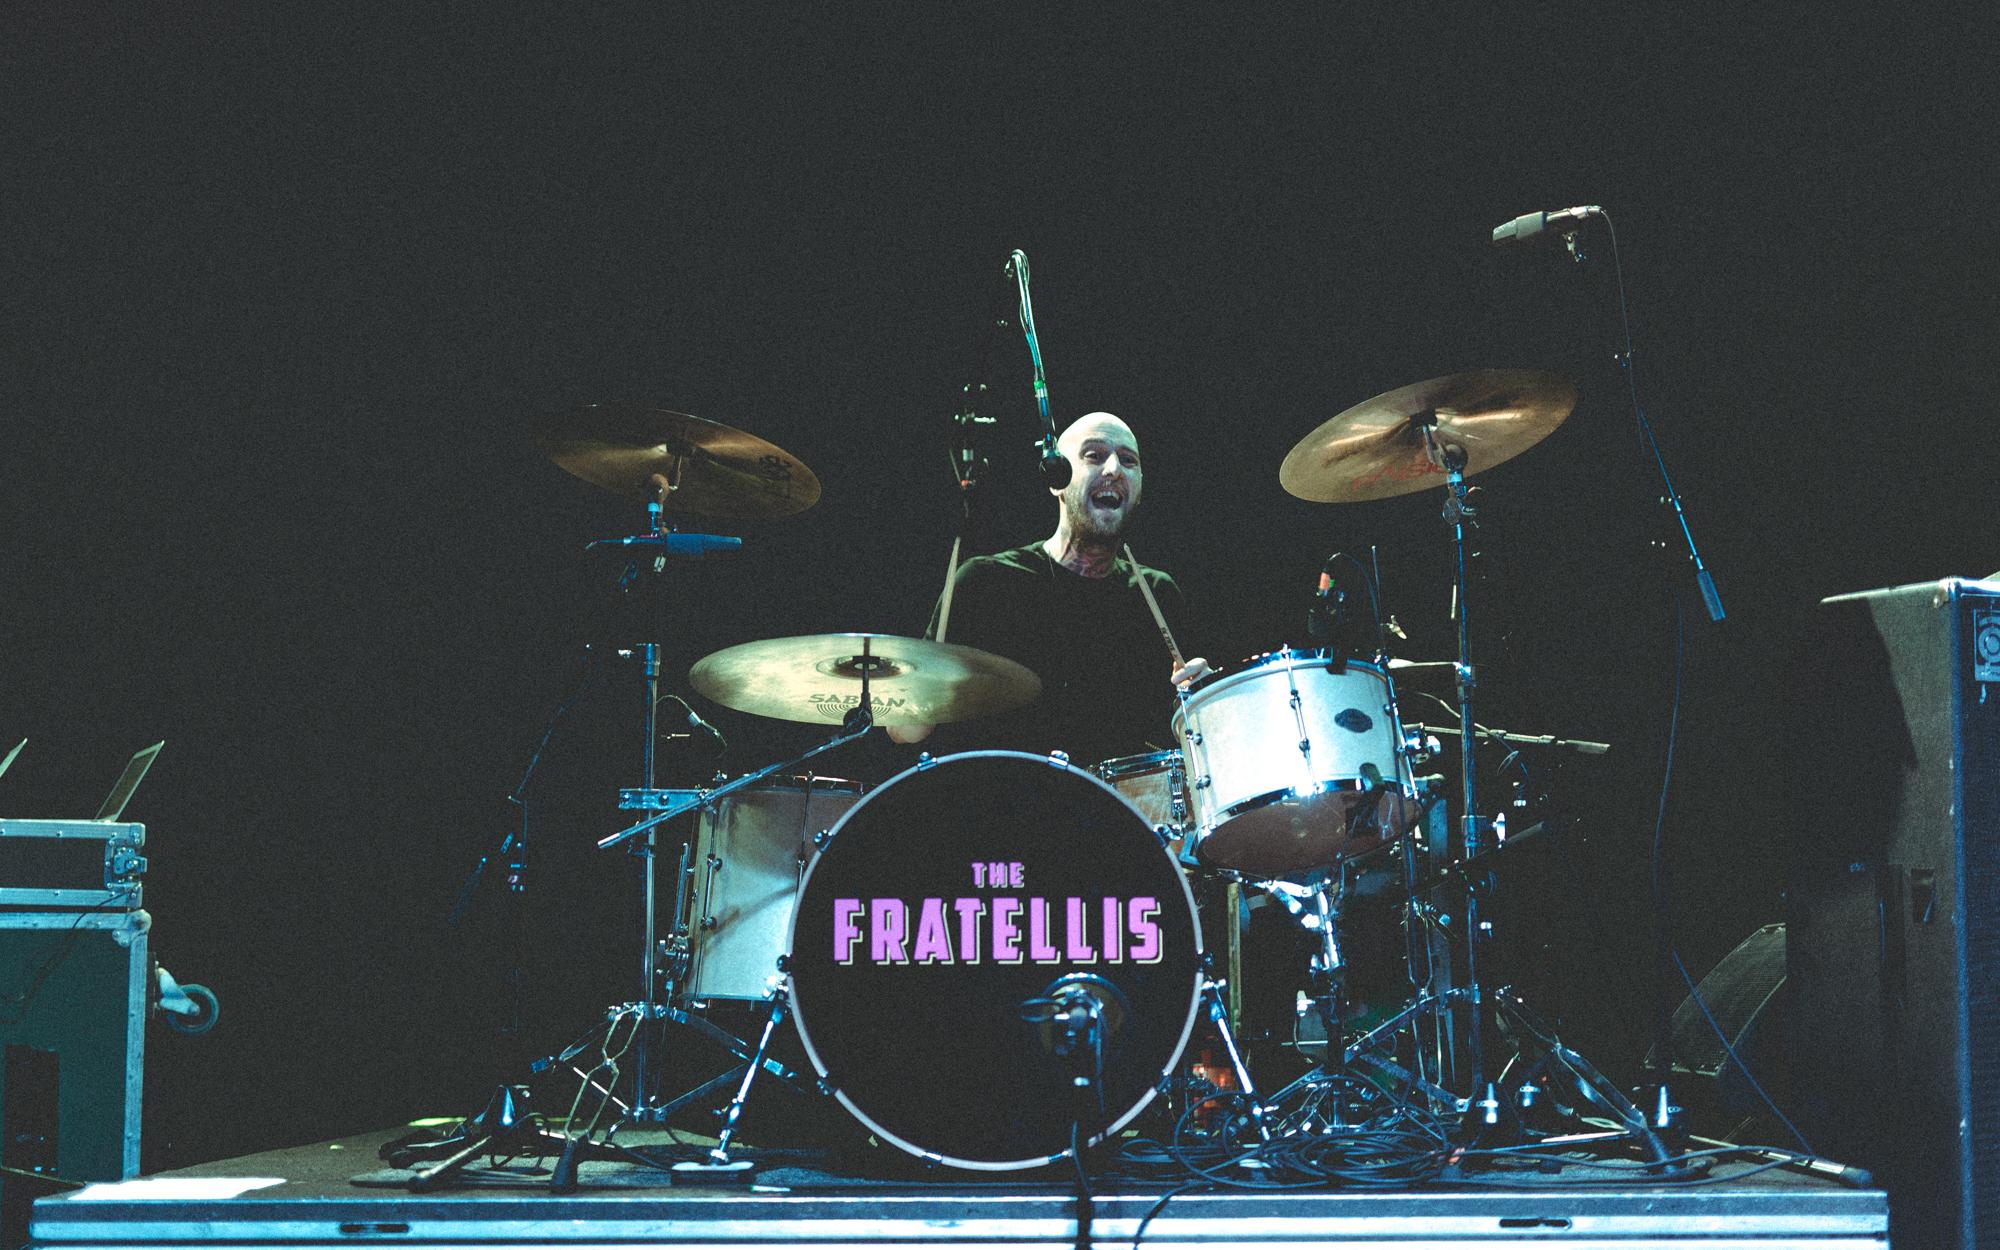 TheFratellis-1915.jpg